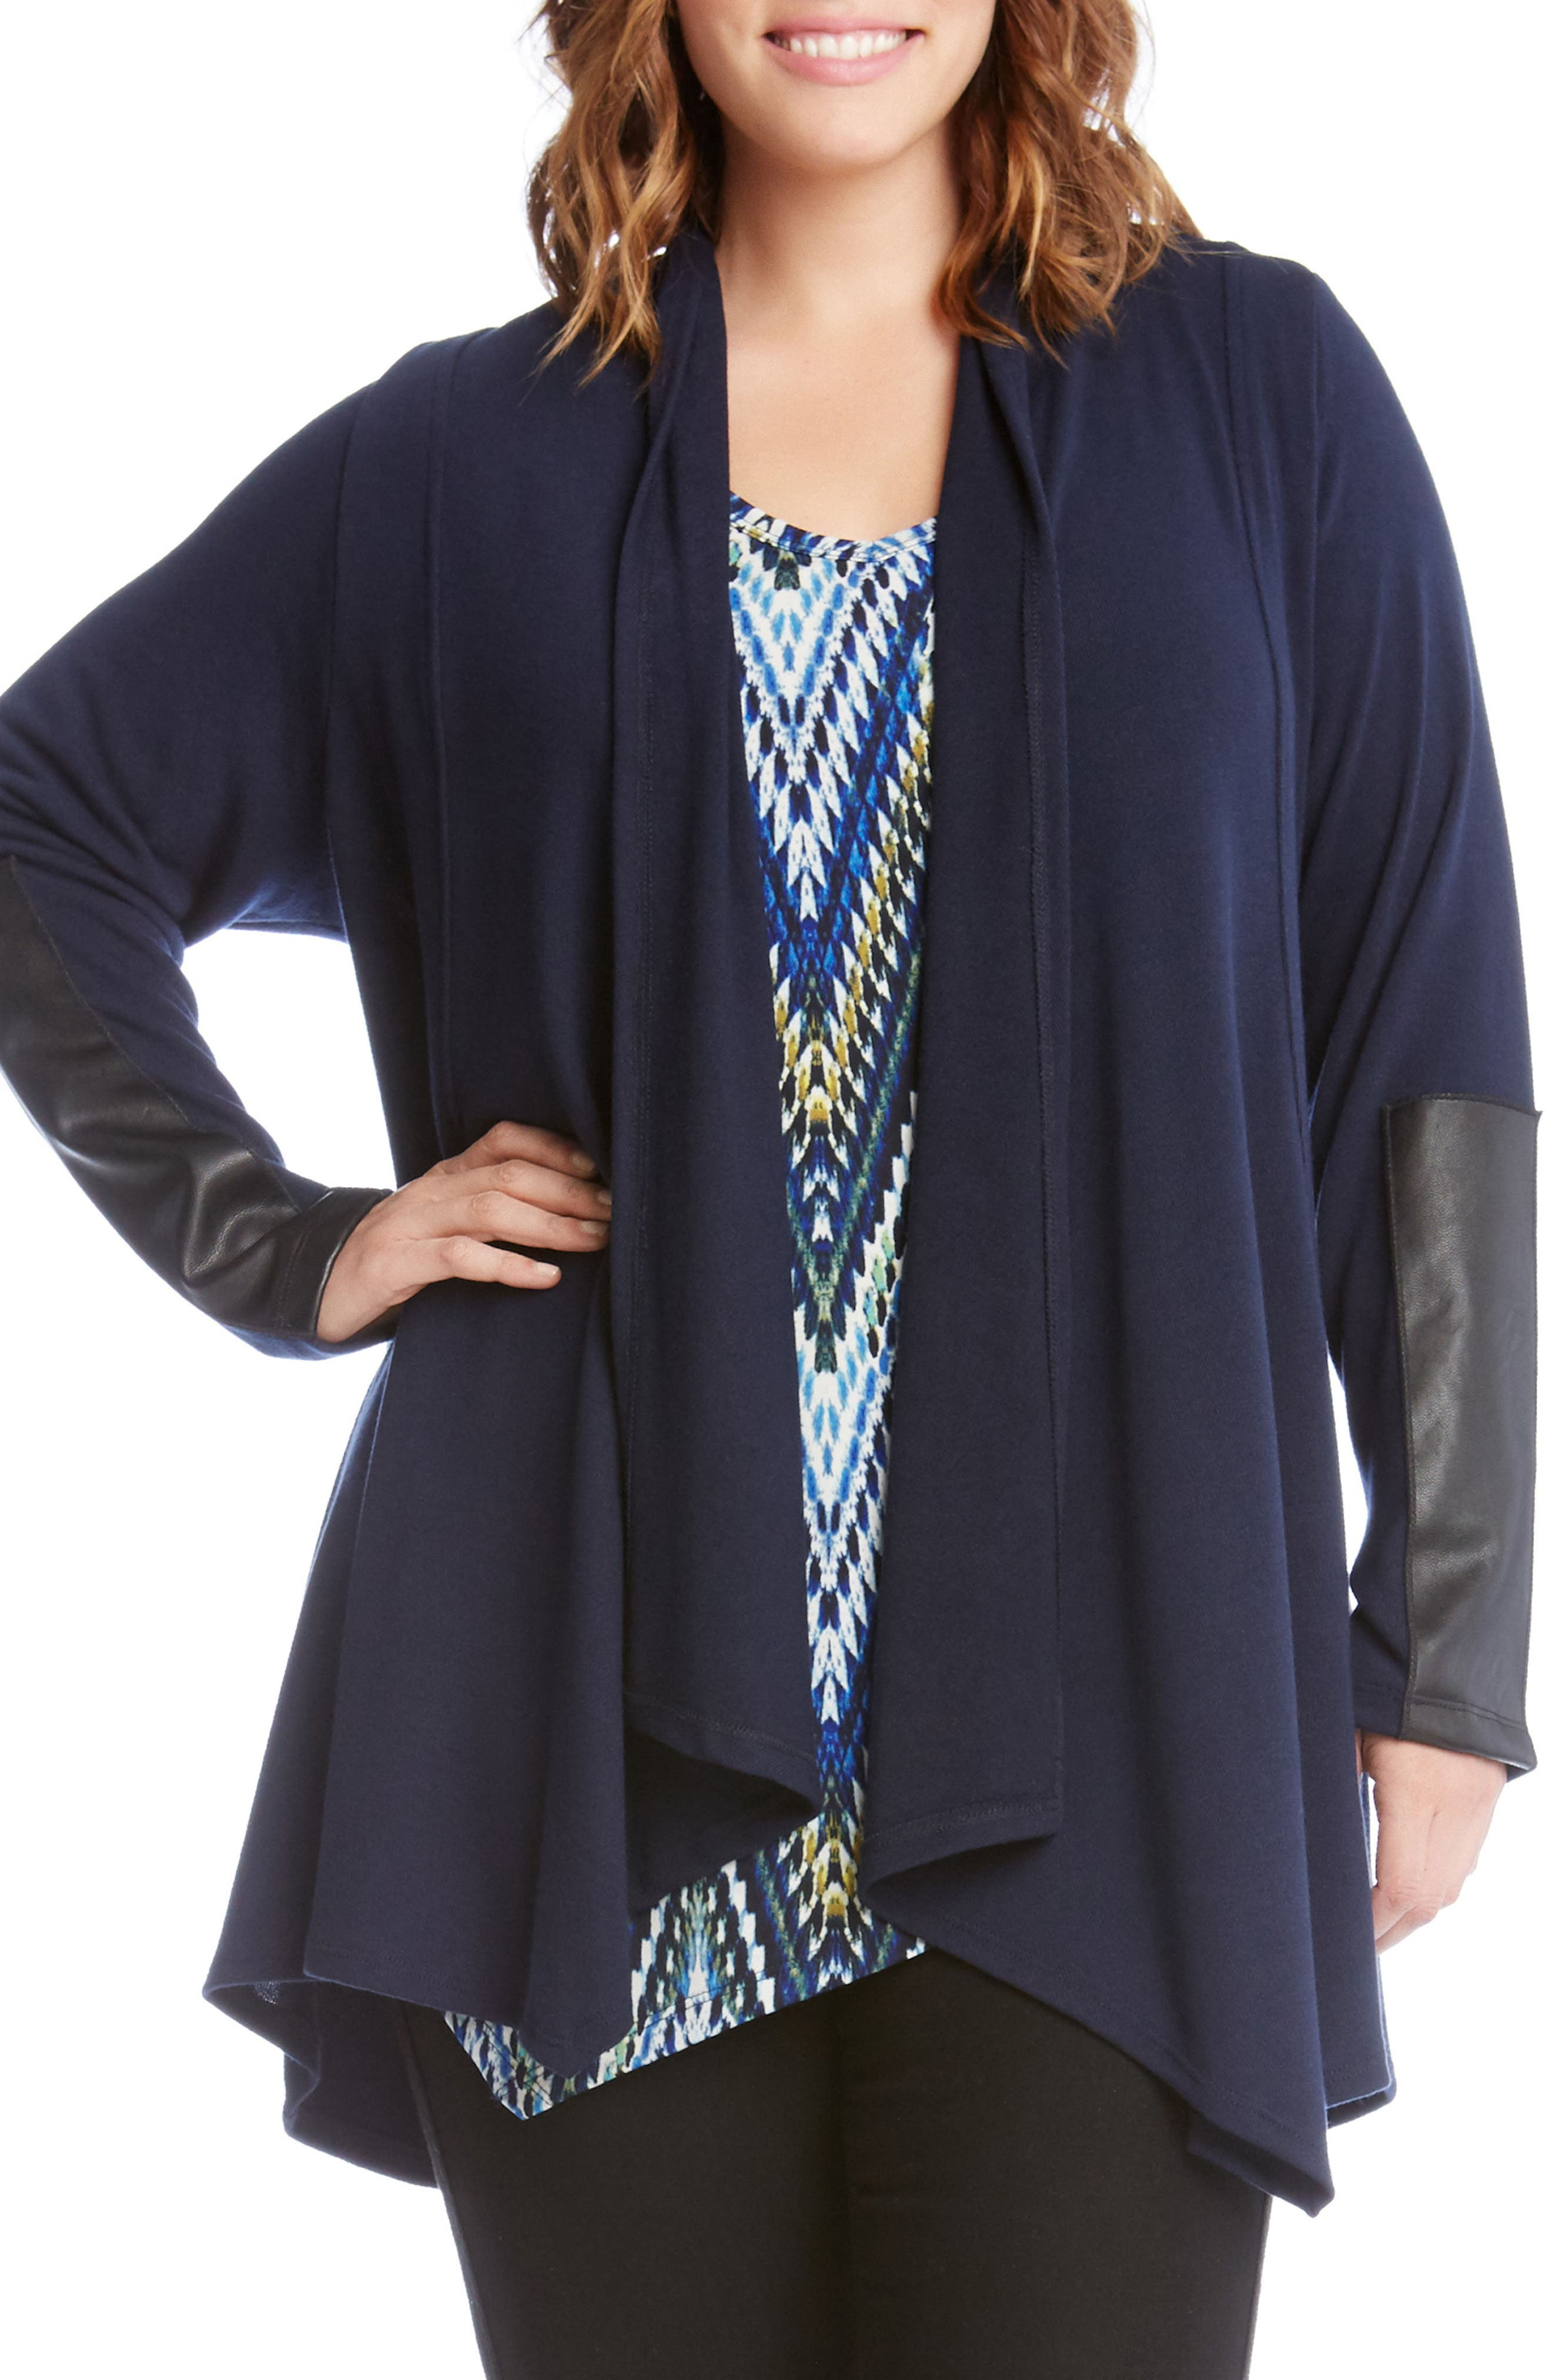 Main Image - Karen Kane Faux Leather Trim Drape Cardigan (Plus Size)